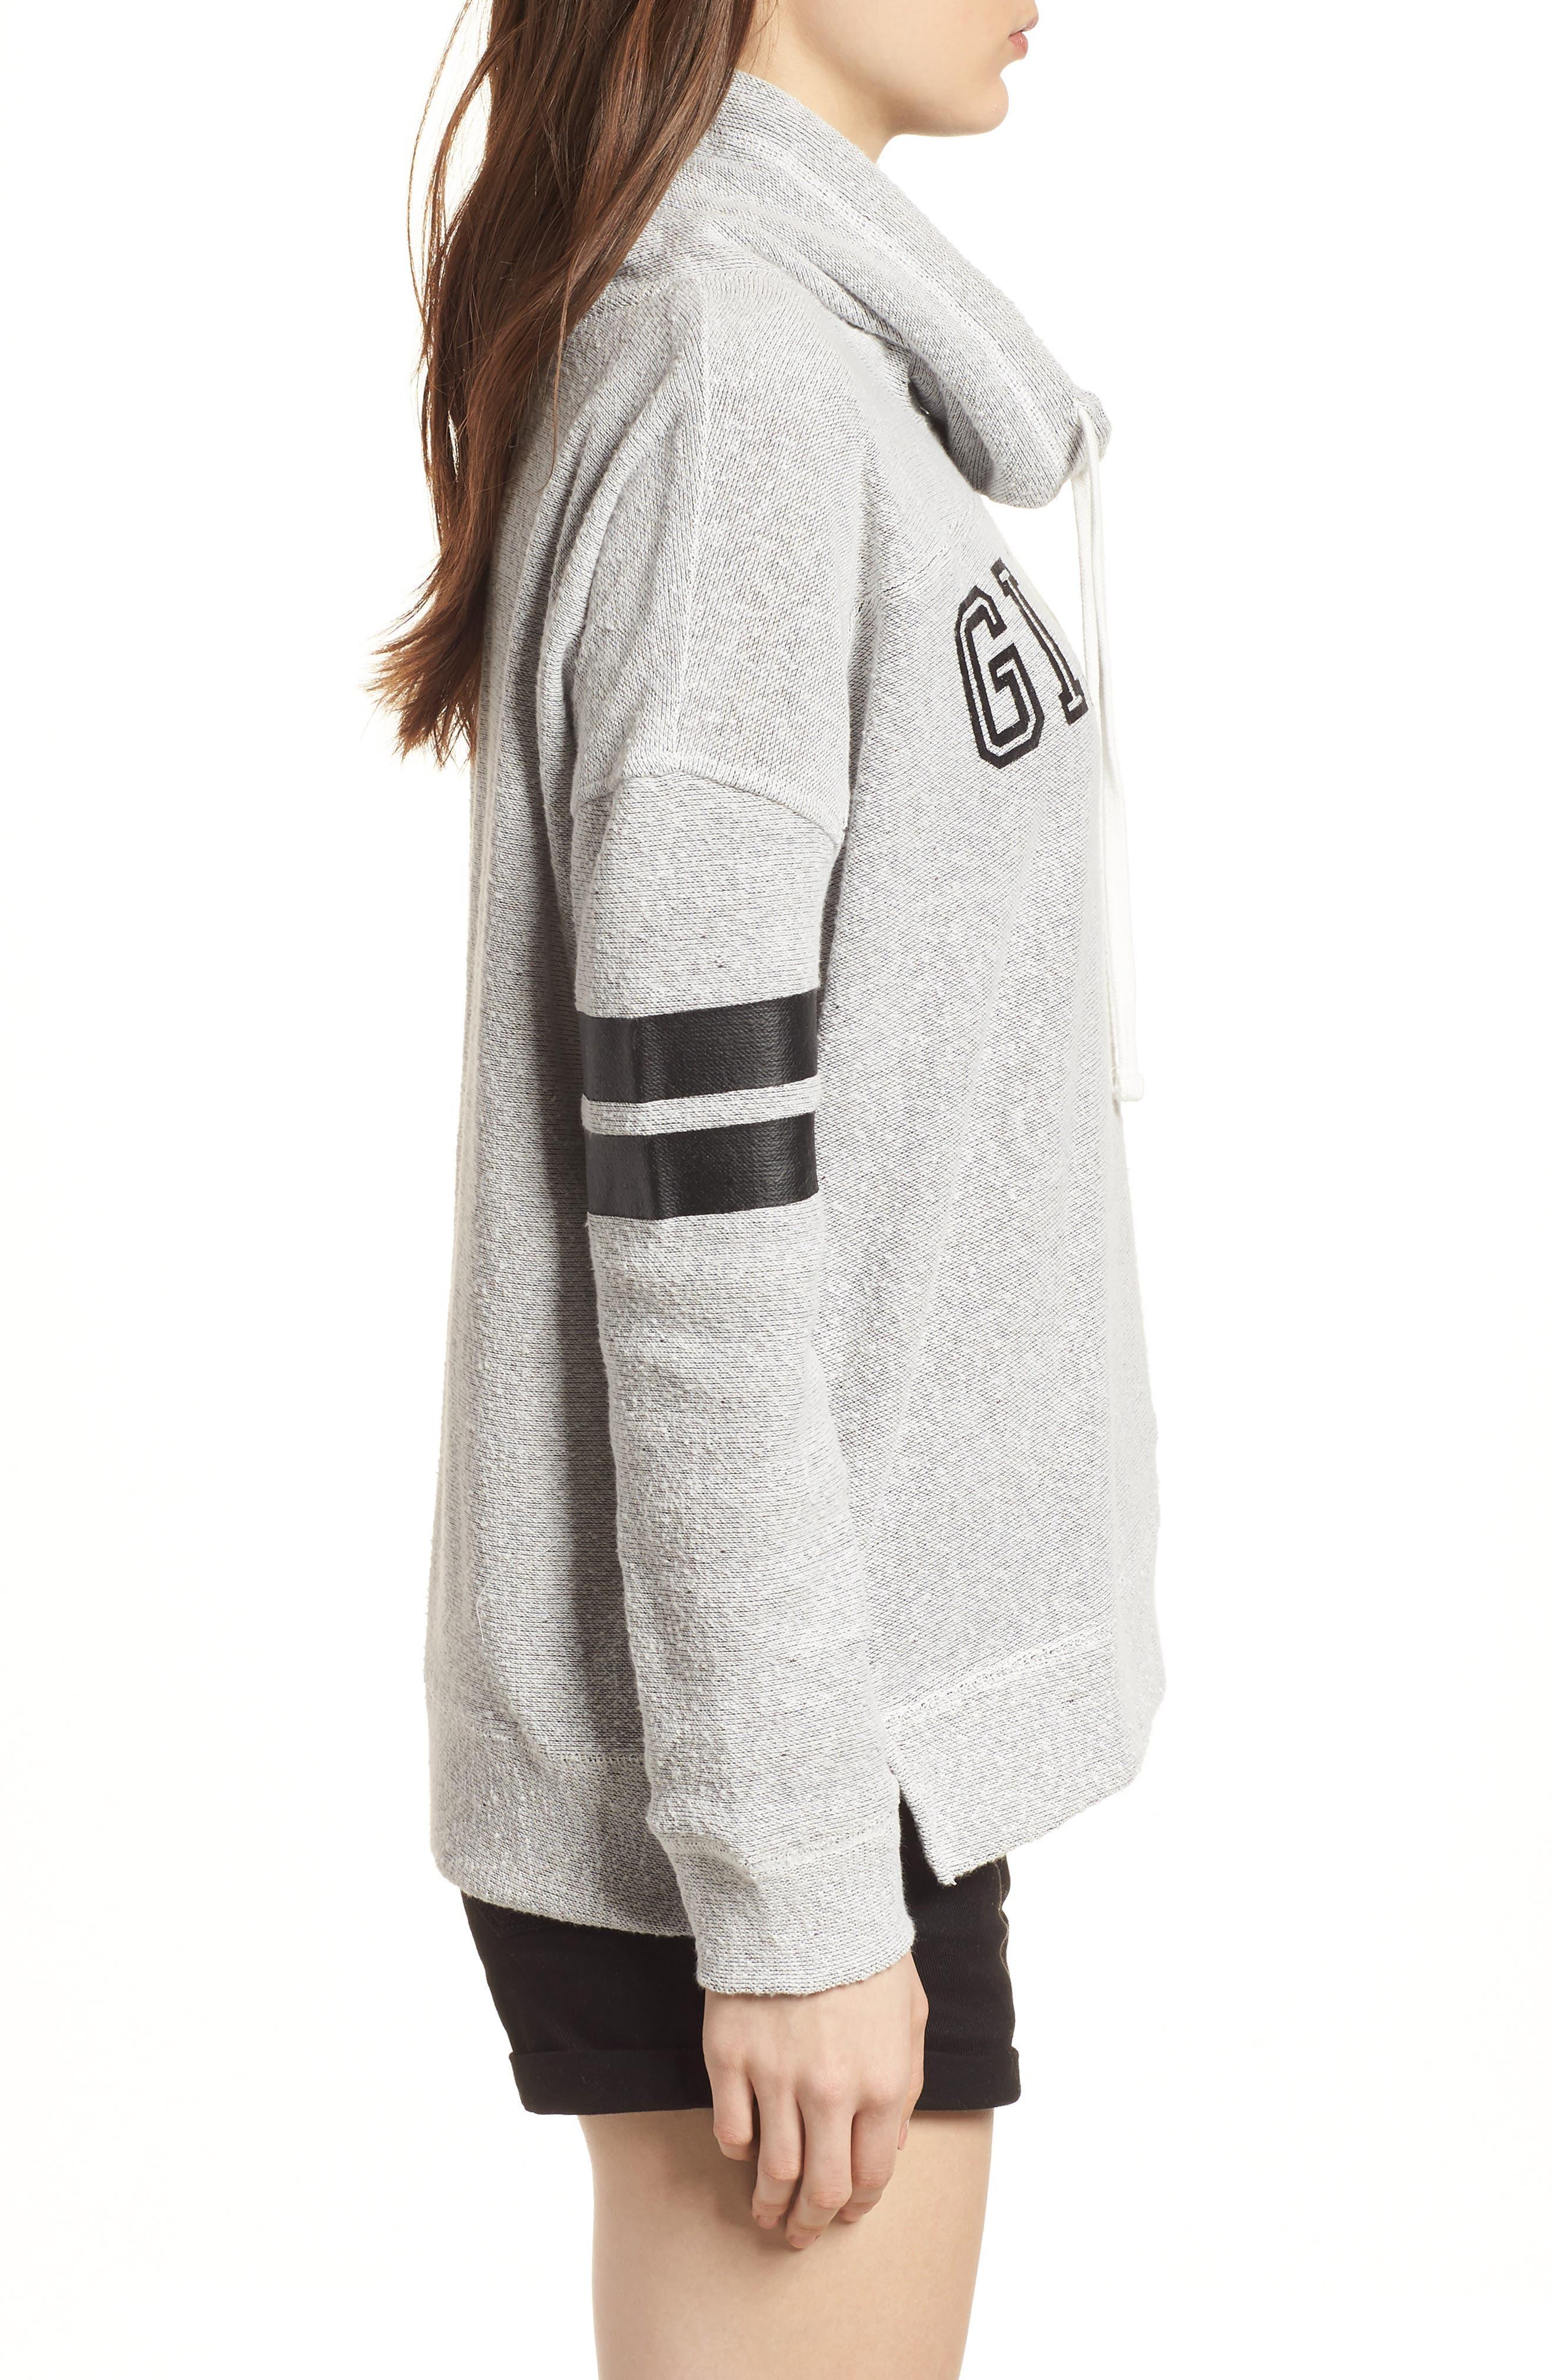 Offsides San Francisco Giants Funnel Neck Sweatshirt,                             Alternate thumbnail 3, color,                             Pumice Grey